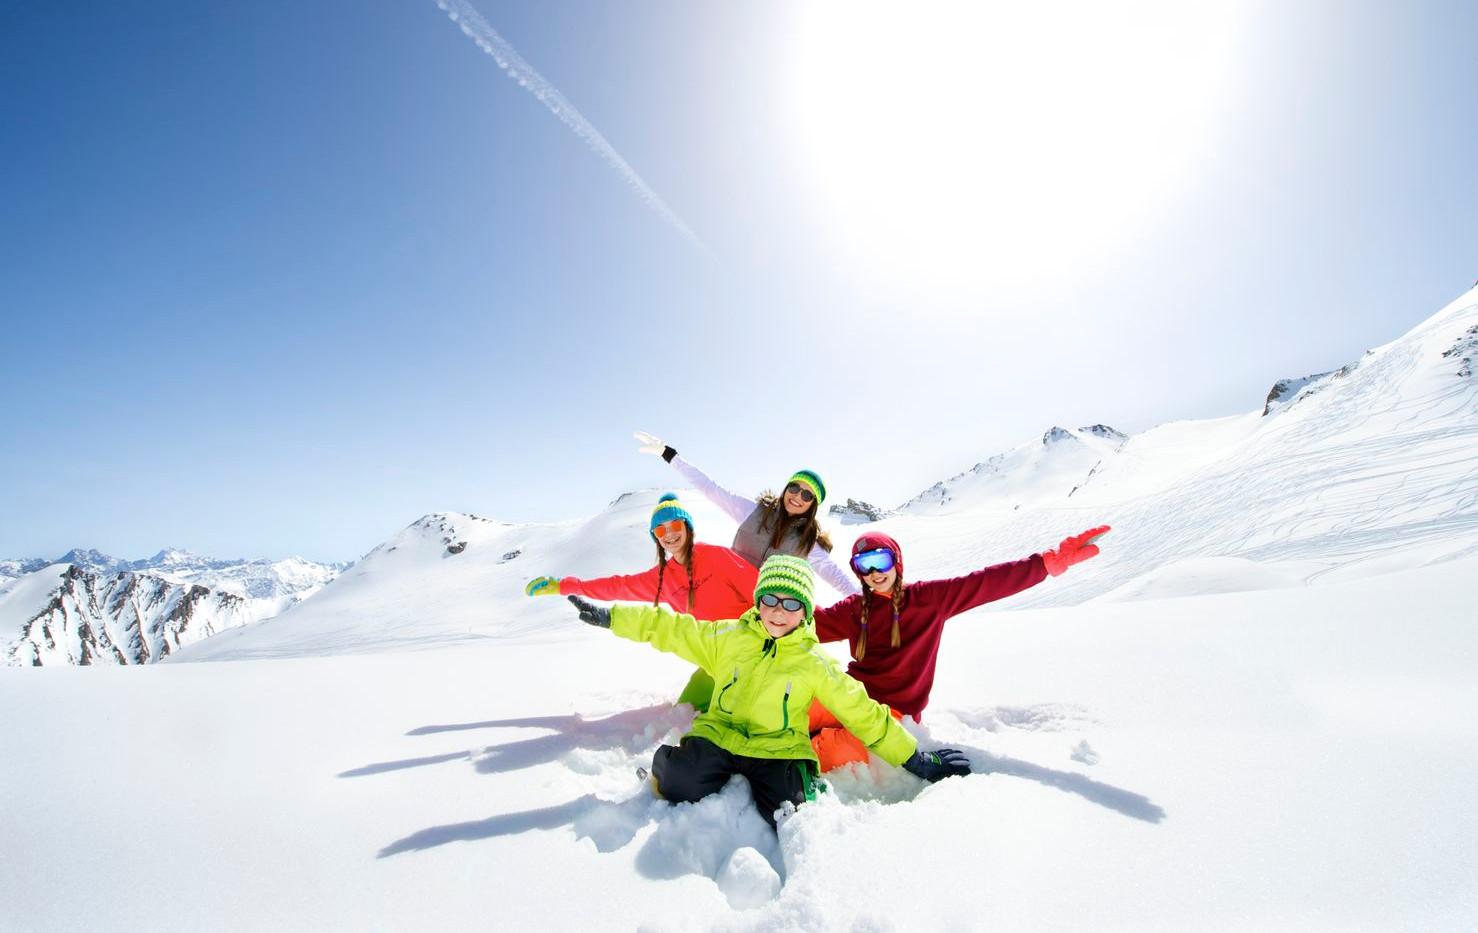 familie_skifahren_sfl.jpg